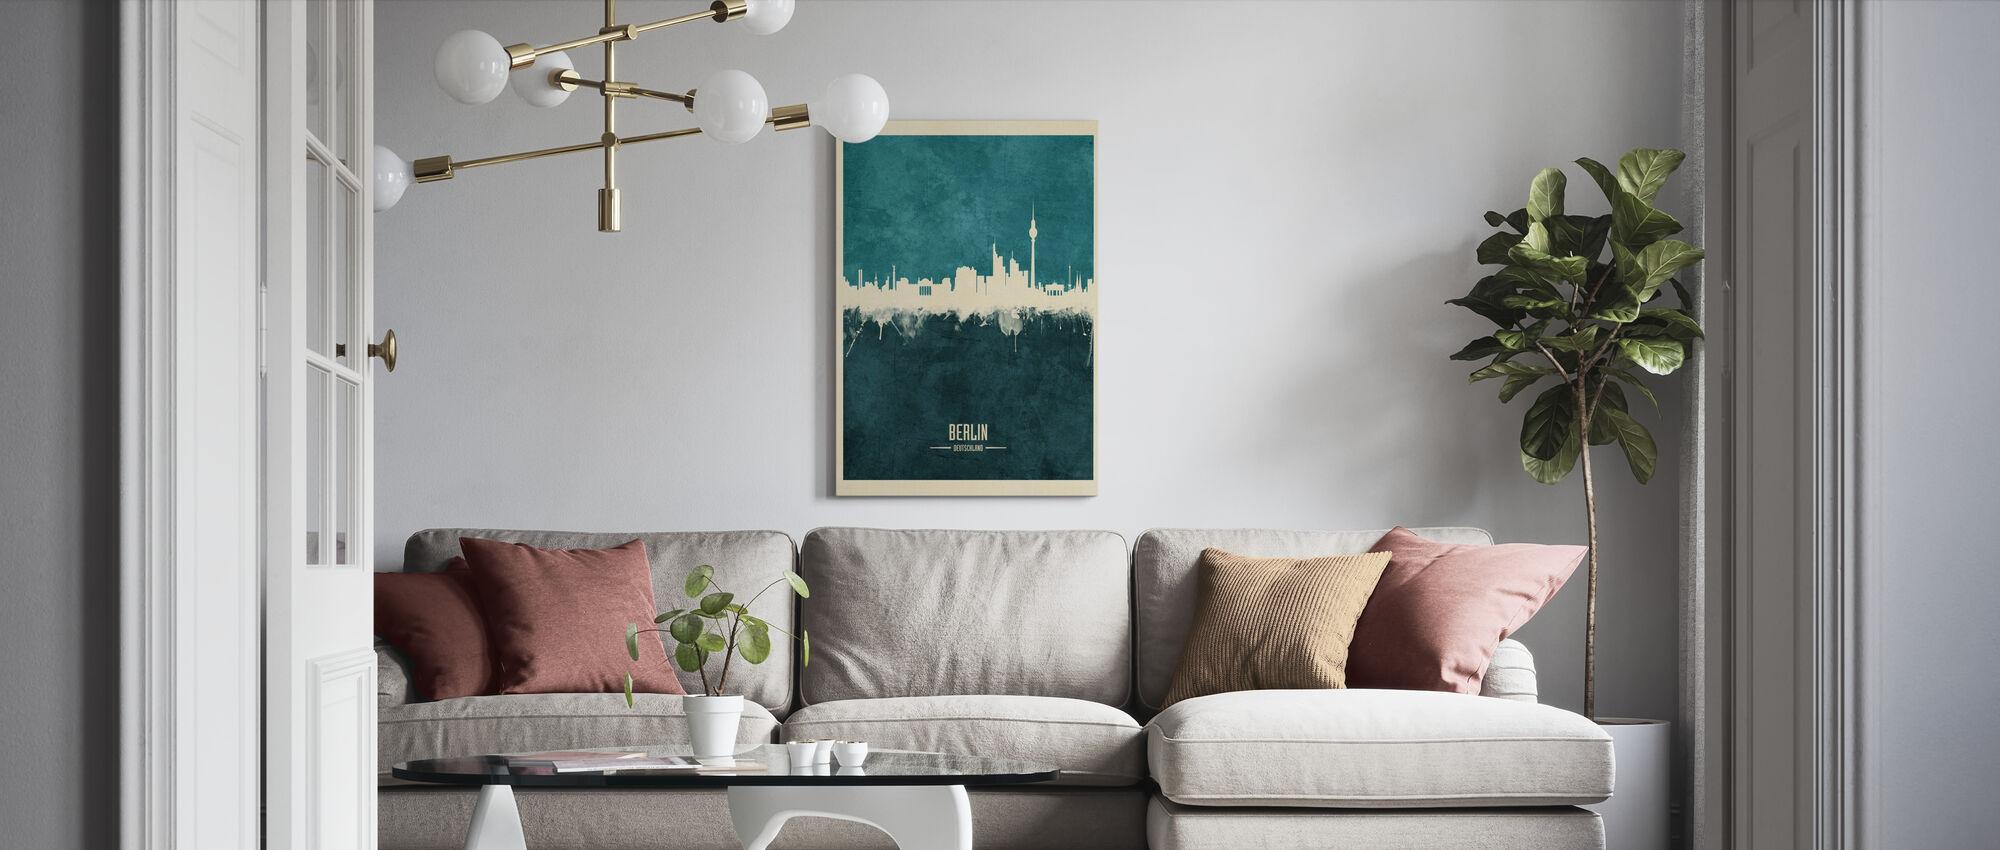 Berlin Germany Skyline Blue - Canvas print - Living Room